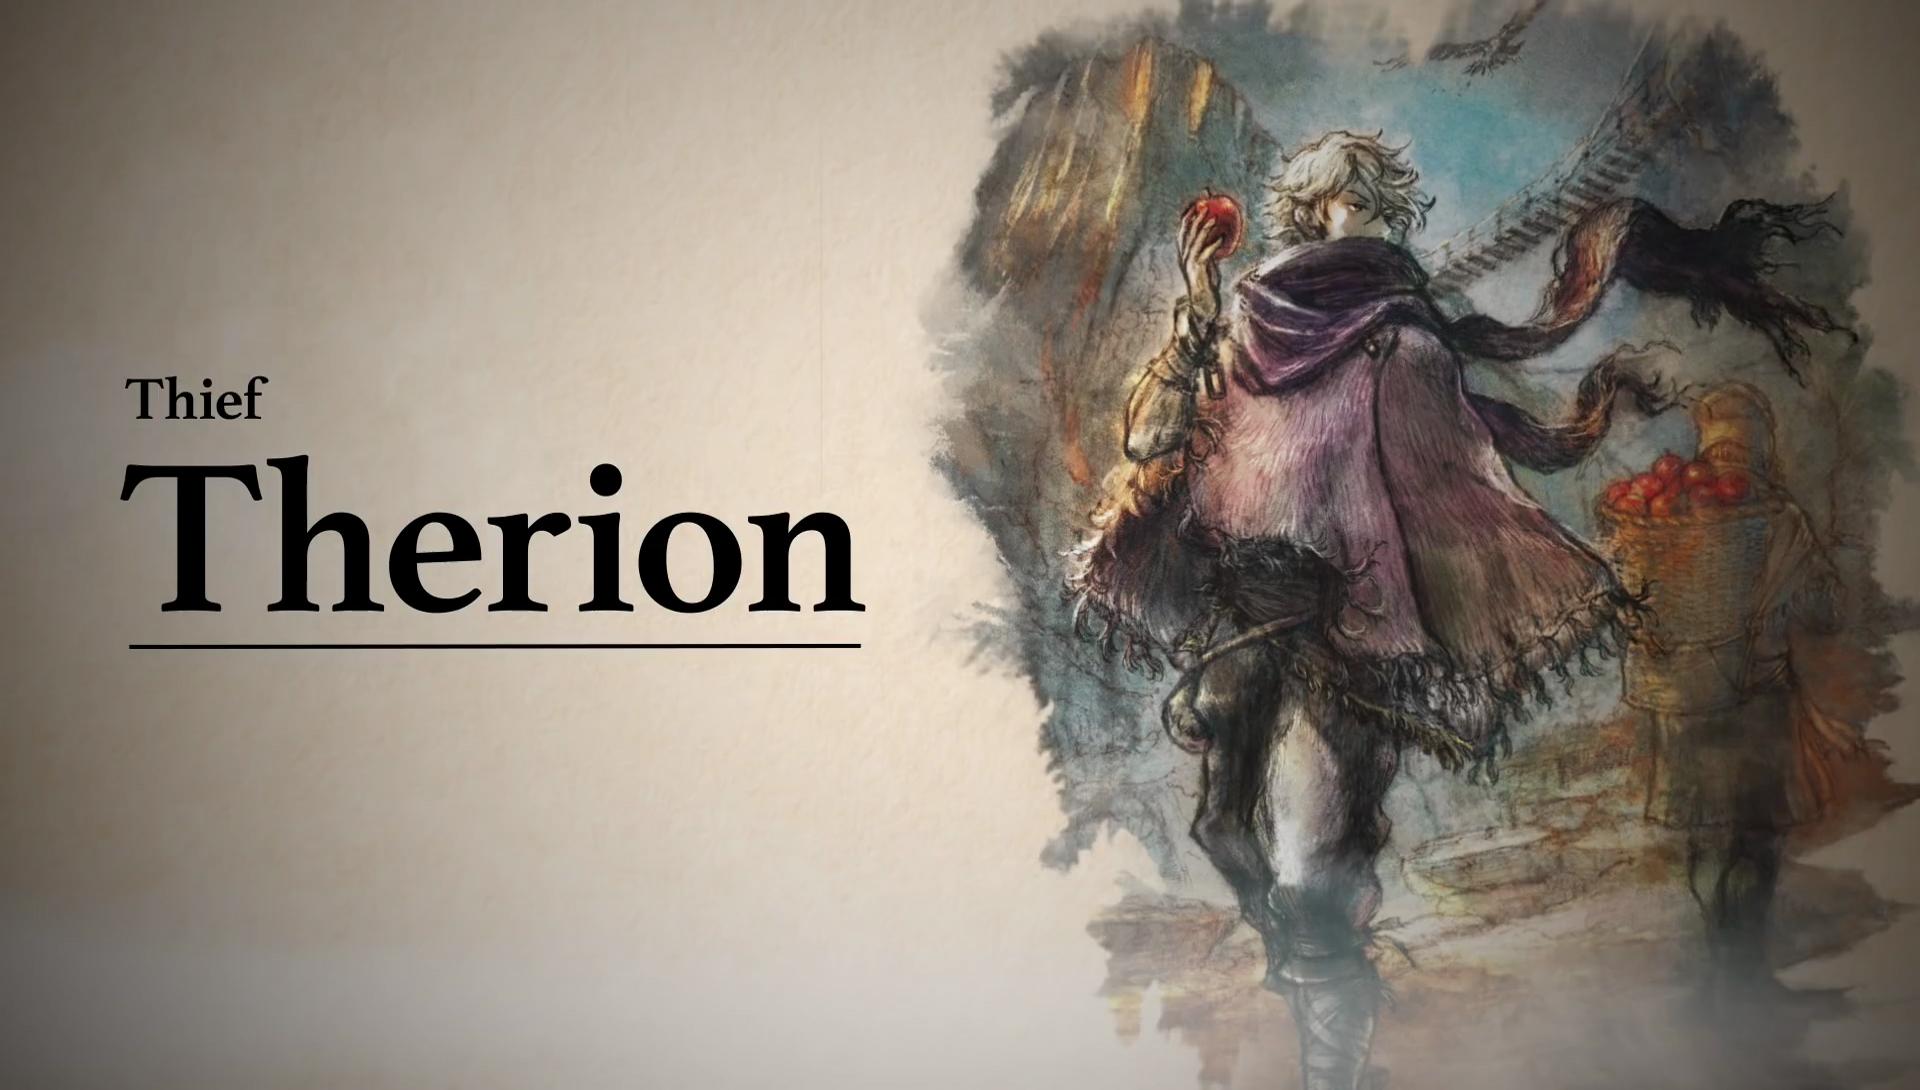 Wallpaper : Octopath Traveler, video games, Thief ...